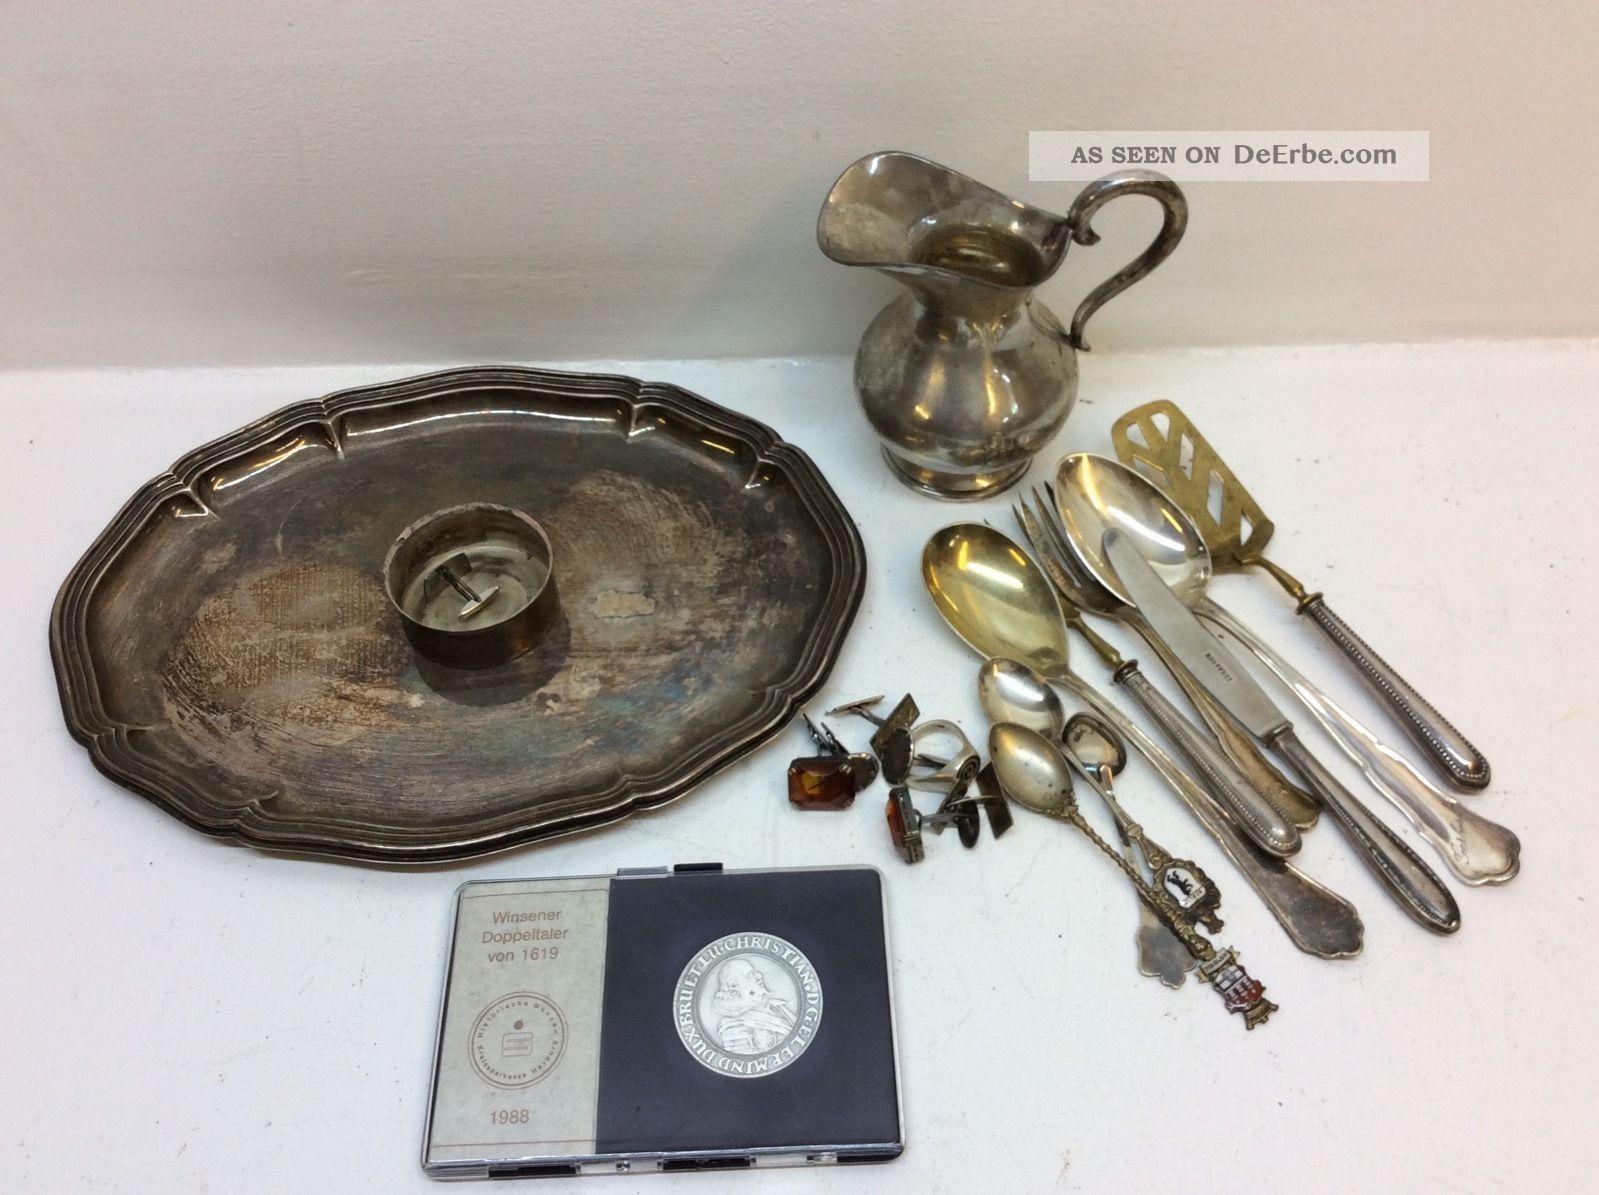 Silber Schrott Konvolut 800er 925er 999er Feinsilber Münze Objekte nach 1945 Bild